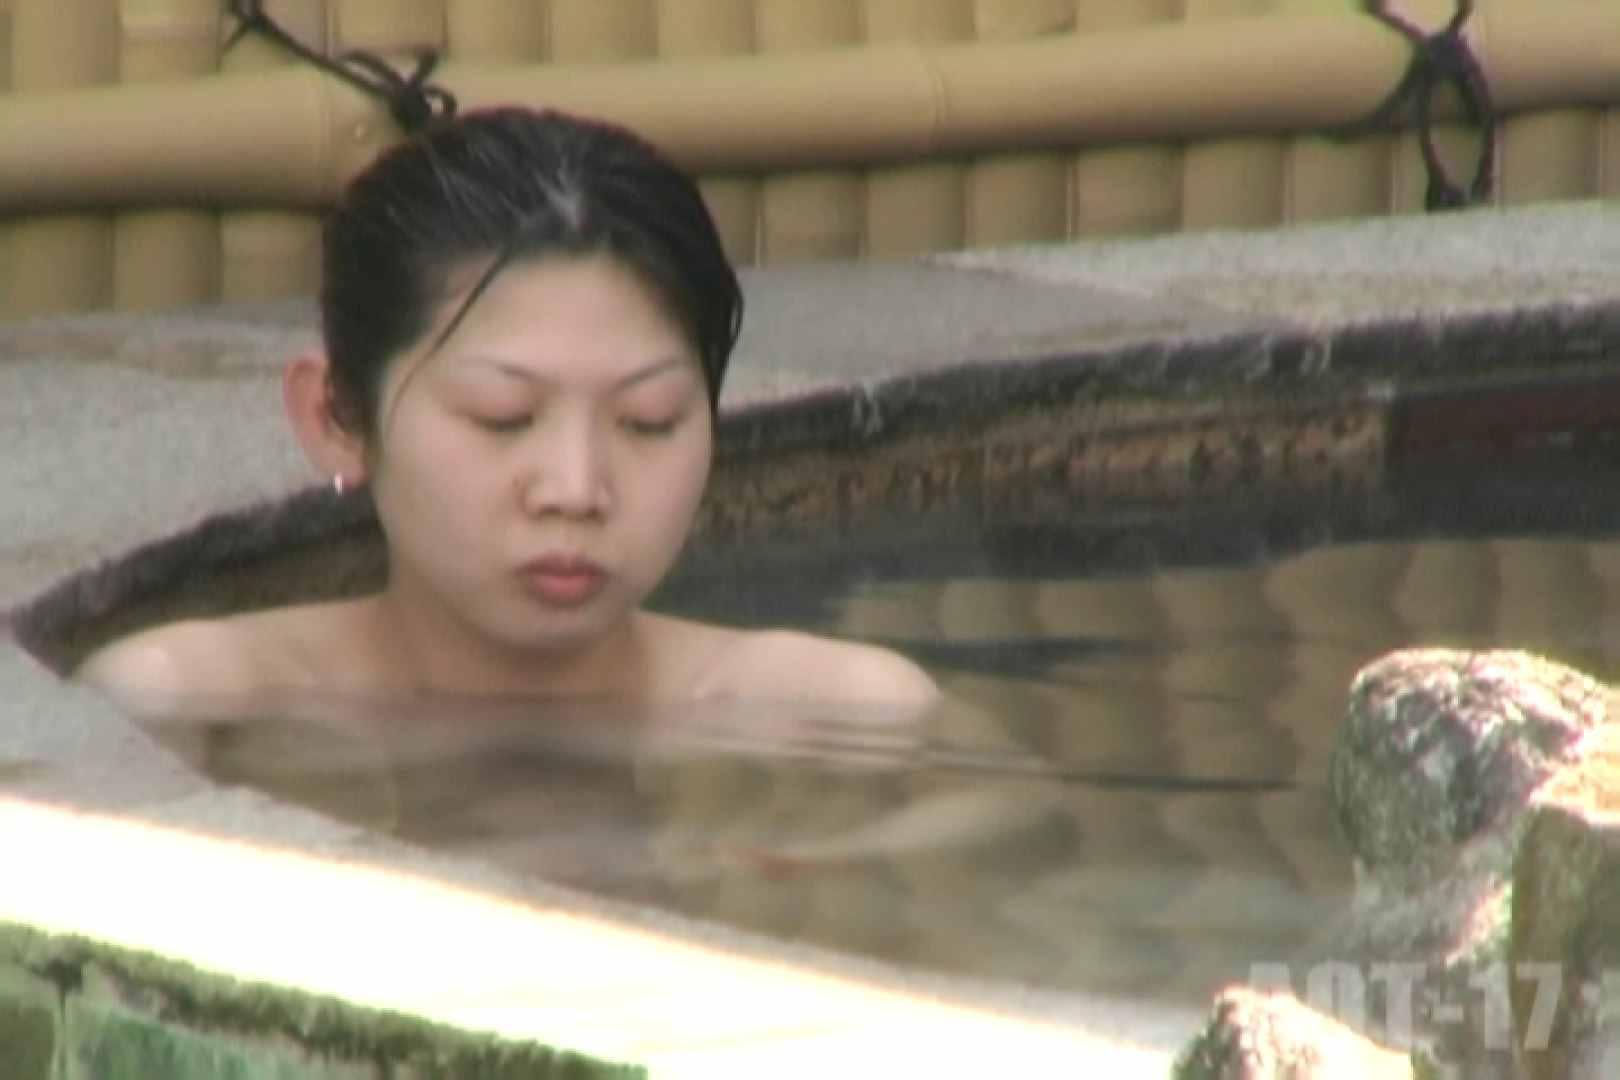 Aquaな露天風呂Vol.850 露天 | HなOL  79pic 77